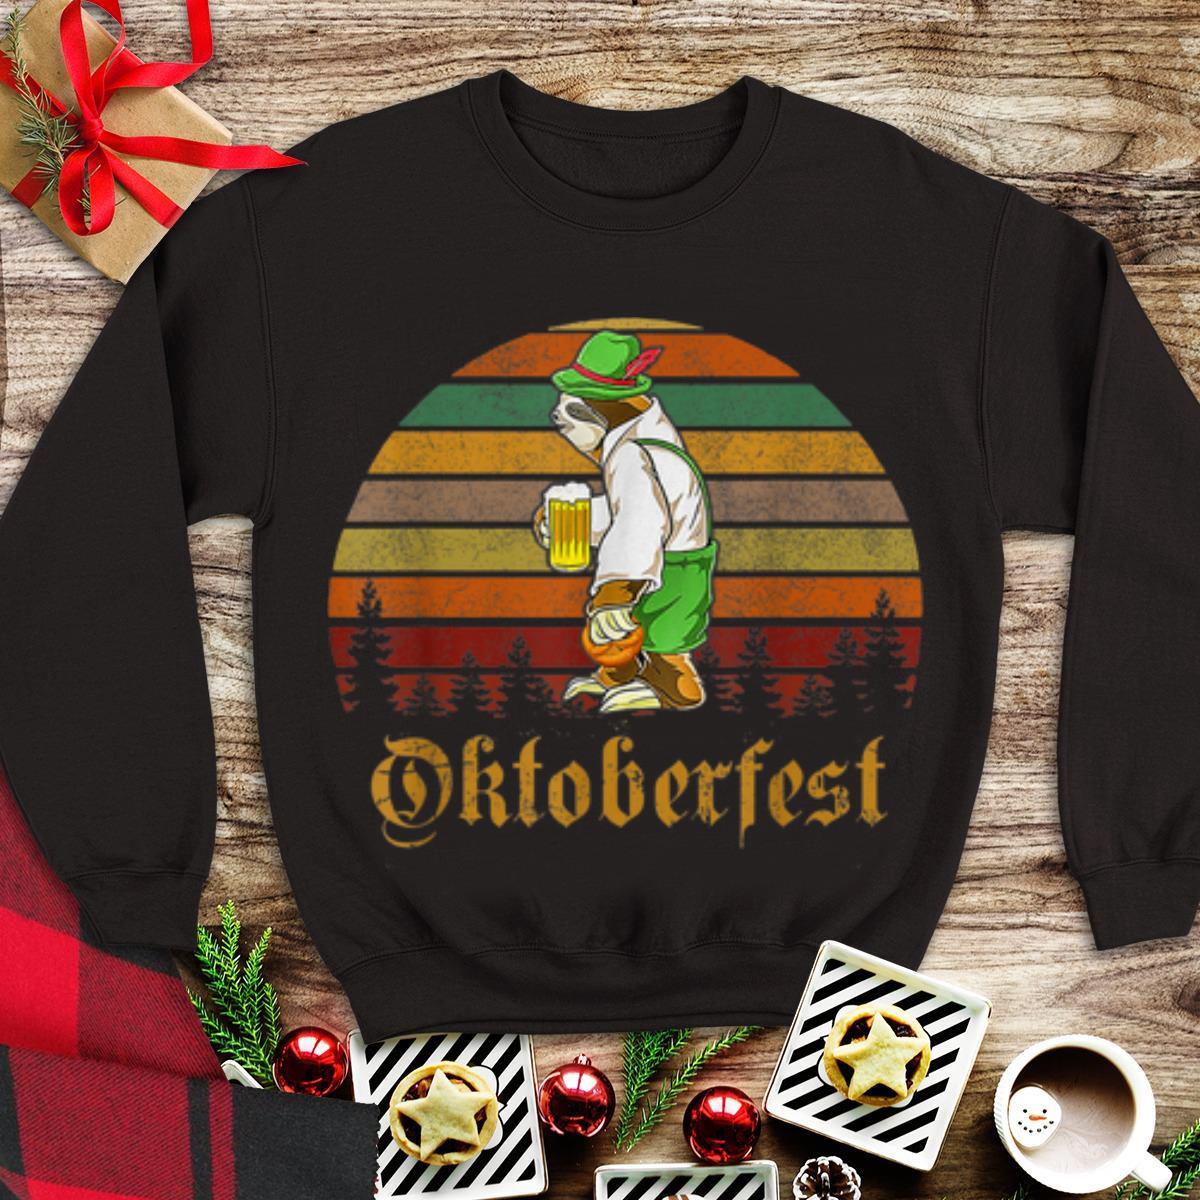 Awesome Vintage Sloth Beer Octoberfest shirt